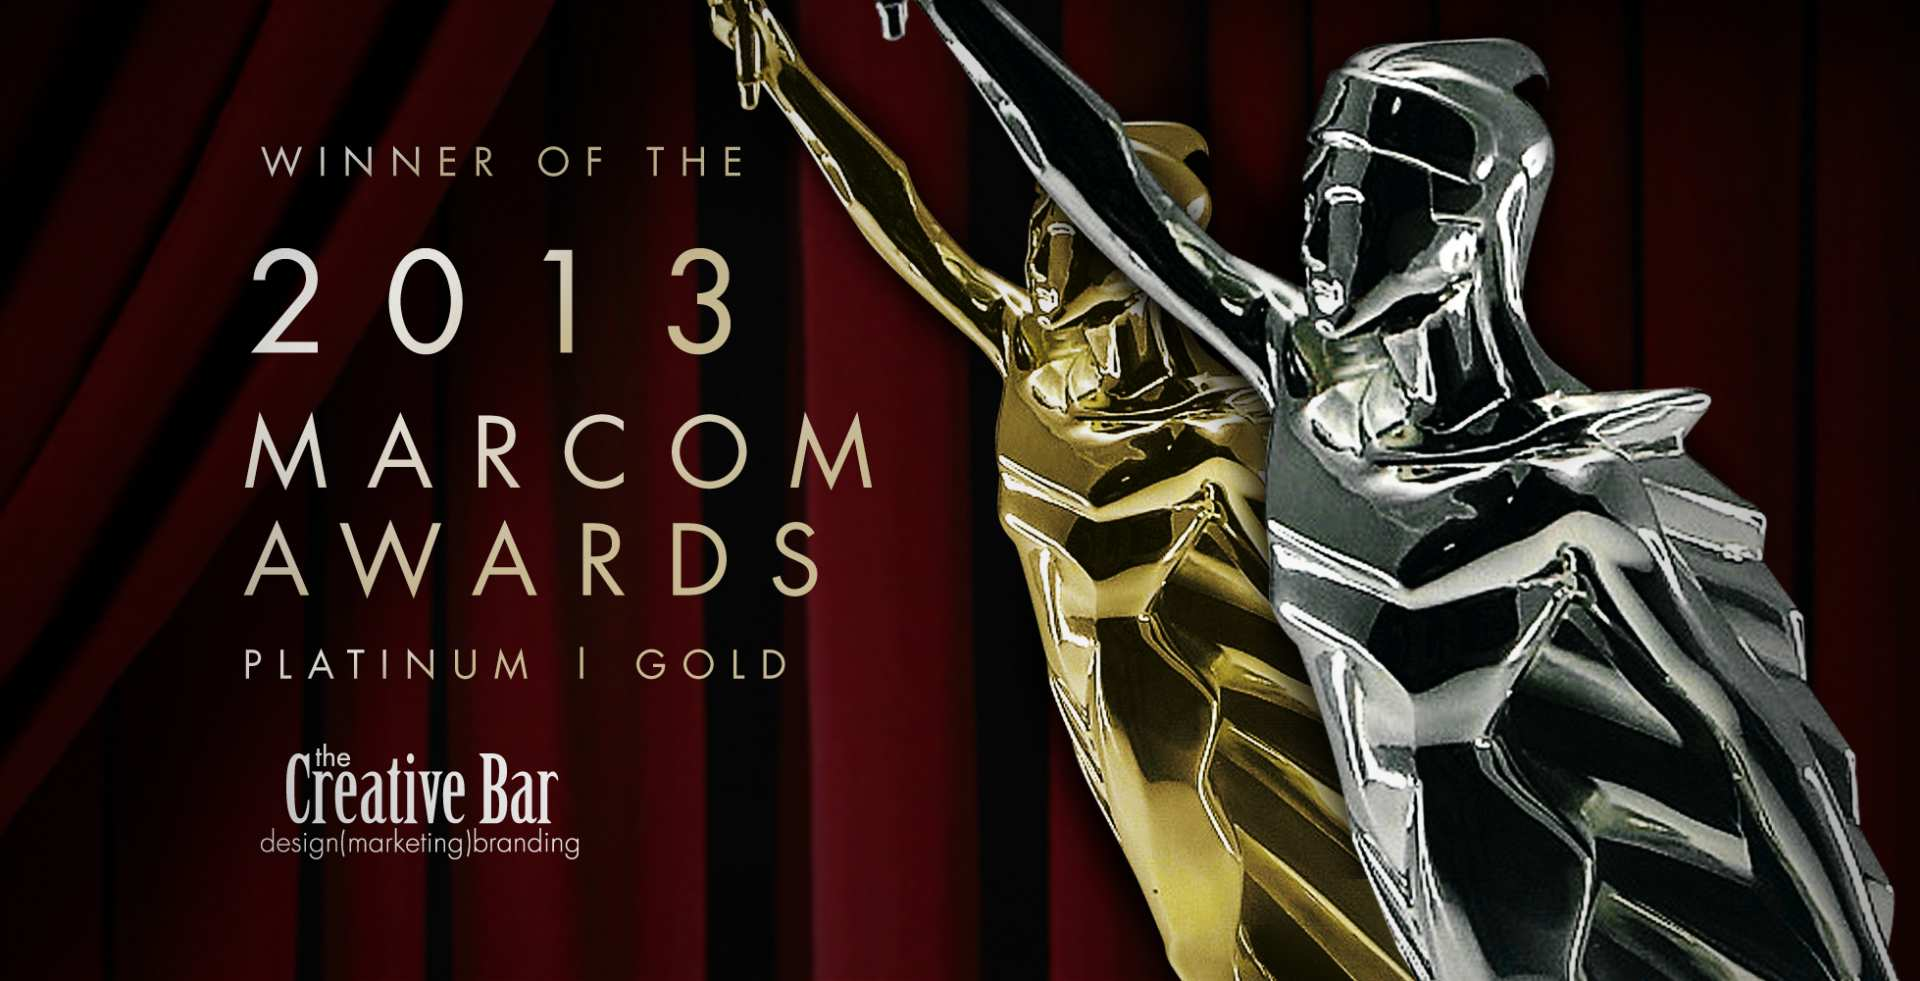 Winner of Marcom Awards - The Creative Bar